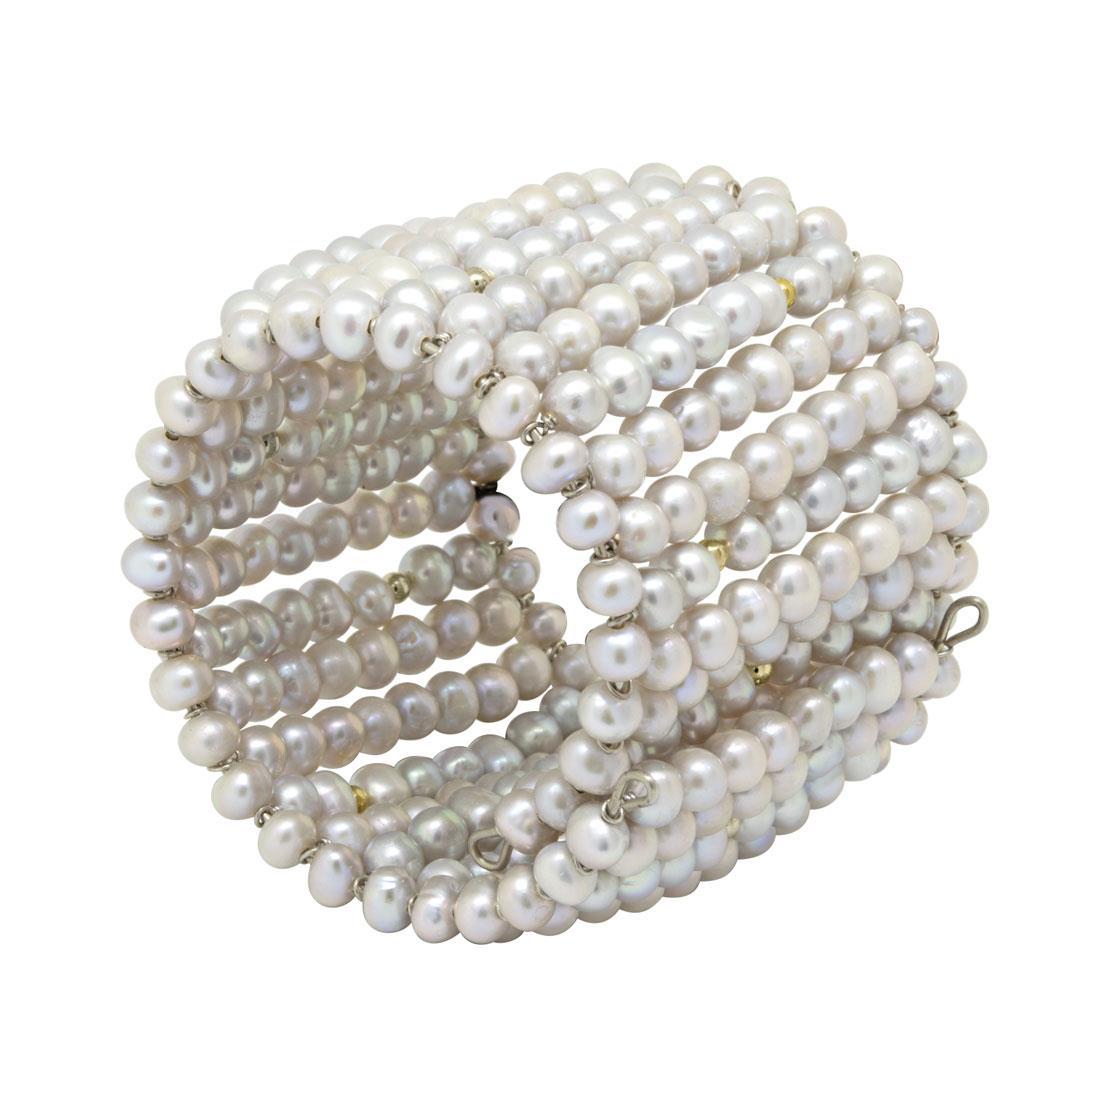 Bracciale rigido con perle - RIVIK